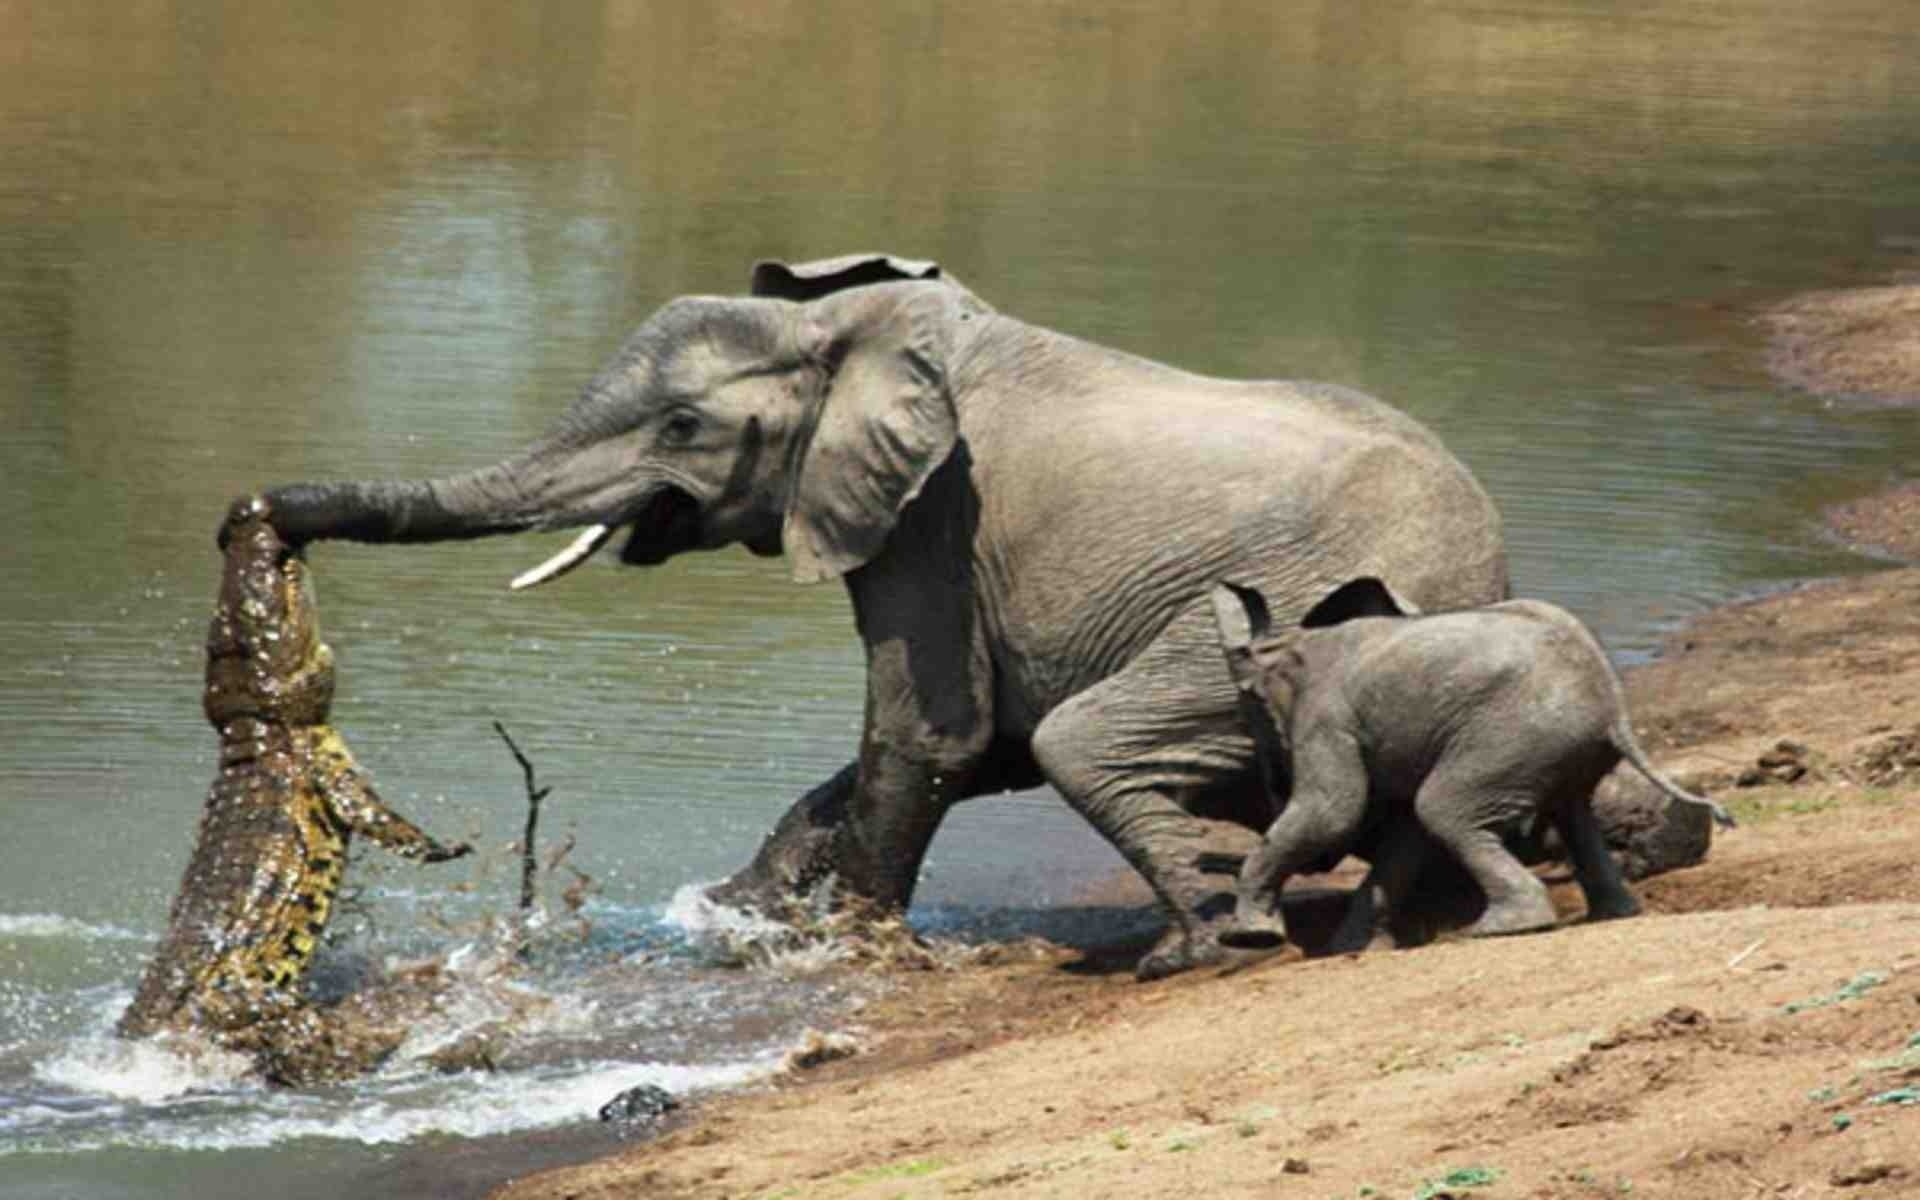 Elephant desktop wallpaper 77 images - Baby elephant wallpaper ...